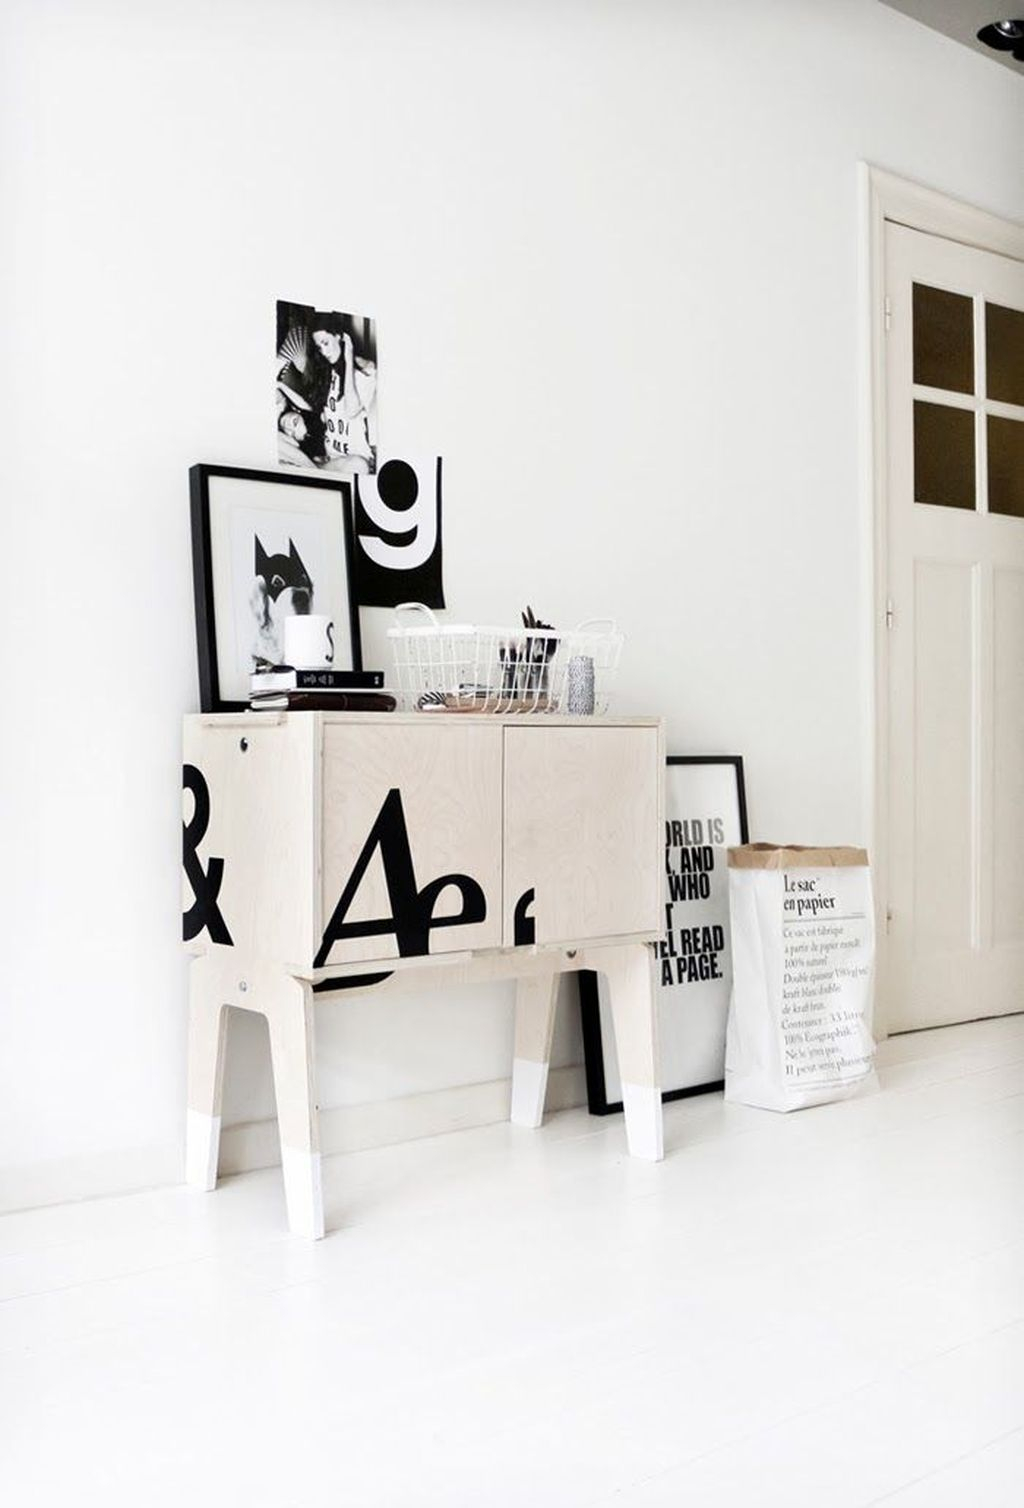 Splendid Deer Shelf Design Ideas With Minimalist Scandinavian Style To Try 03